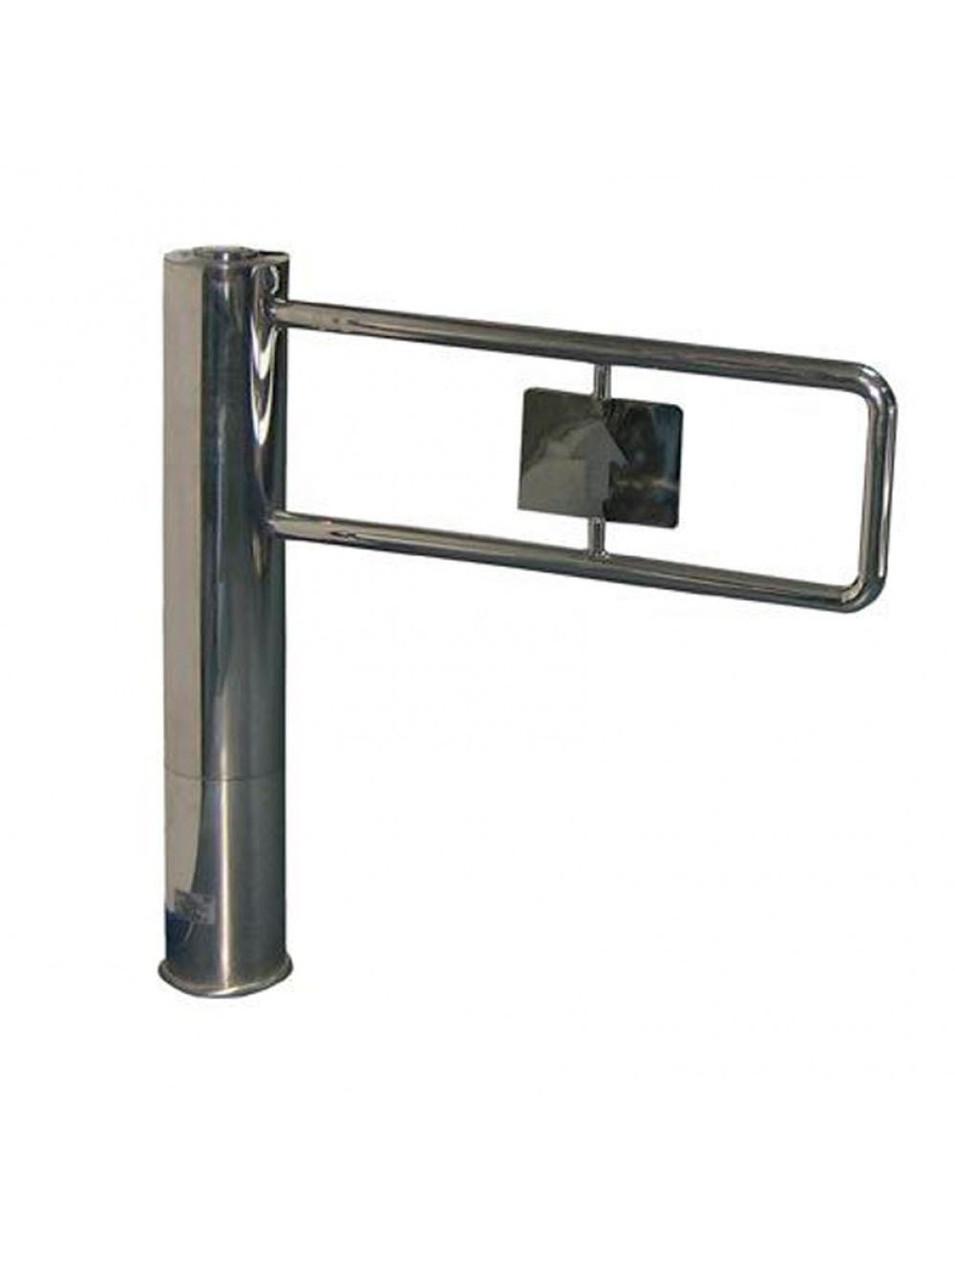 СтилАрм GATE-TS (202-01) T3.KCH.SD